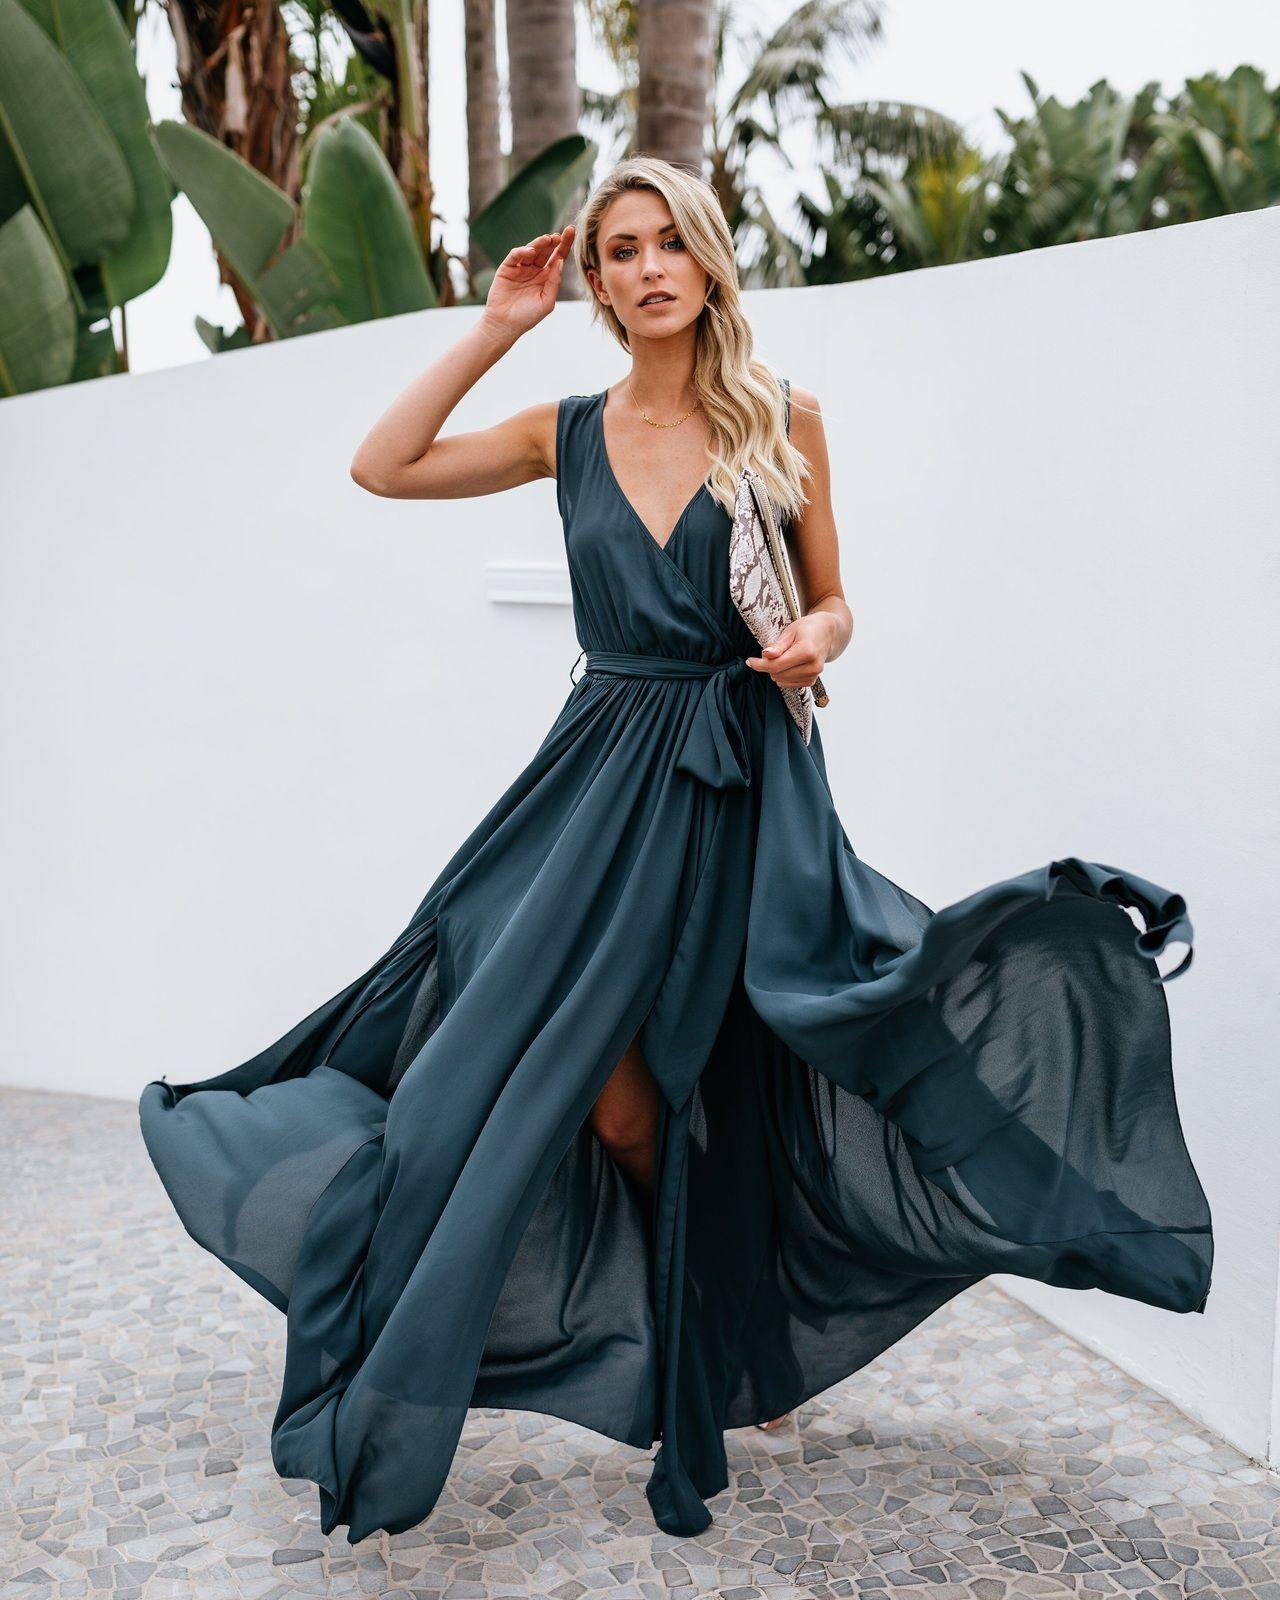 Click On The Photo To Shop This Beautiful Maxi Dress New Dark Green V Neck Belt Women Maxi Wrap Dress Boho Dresses Long Maxi Dress Summer Dresses For Women [ 1600 x 1280 Pixel ]